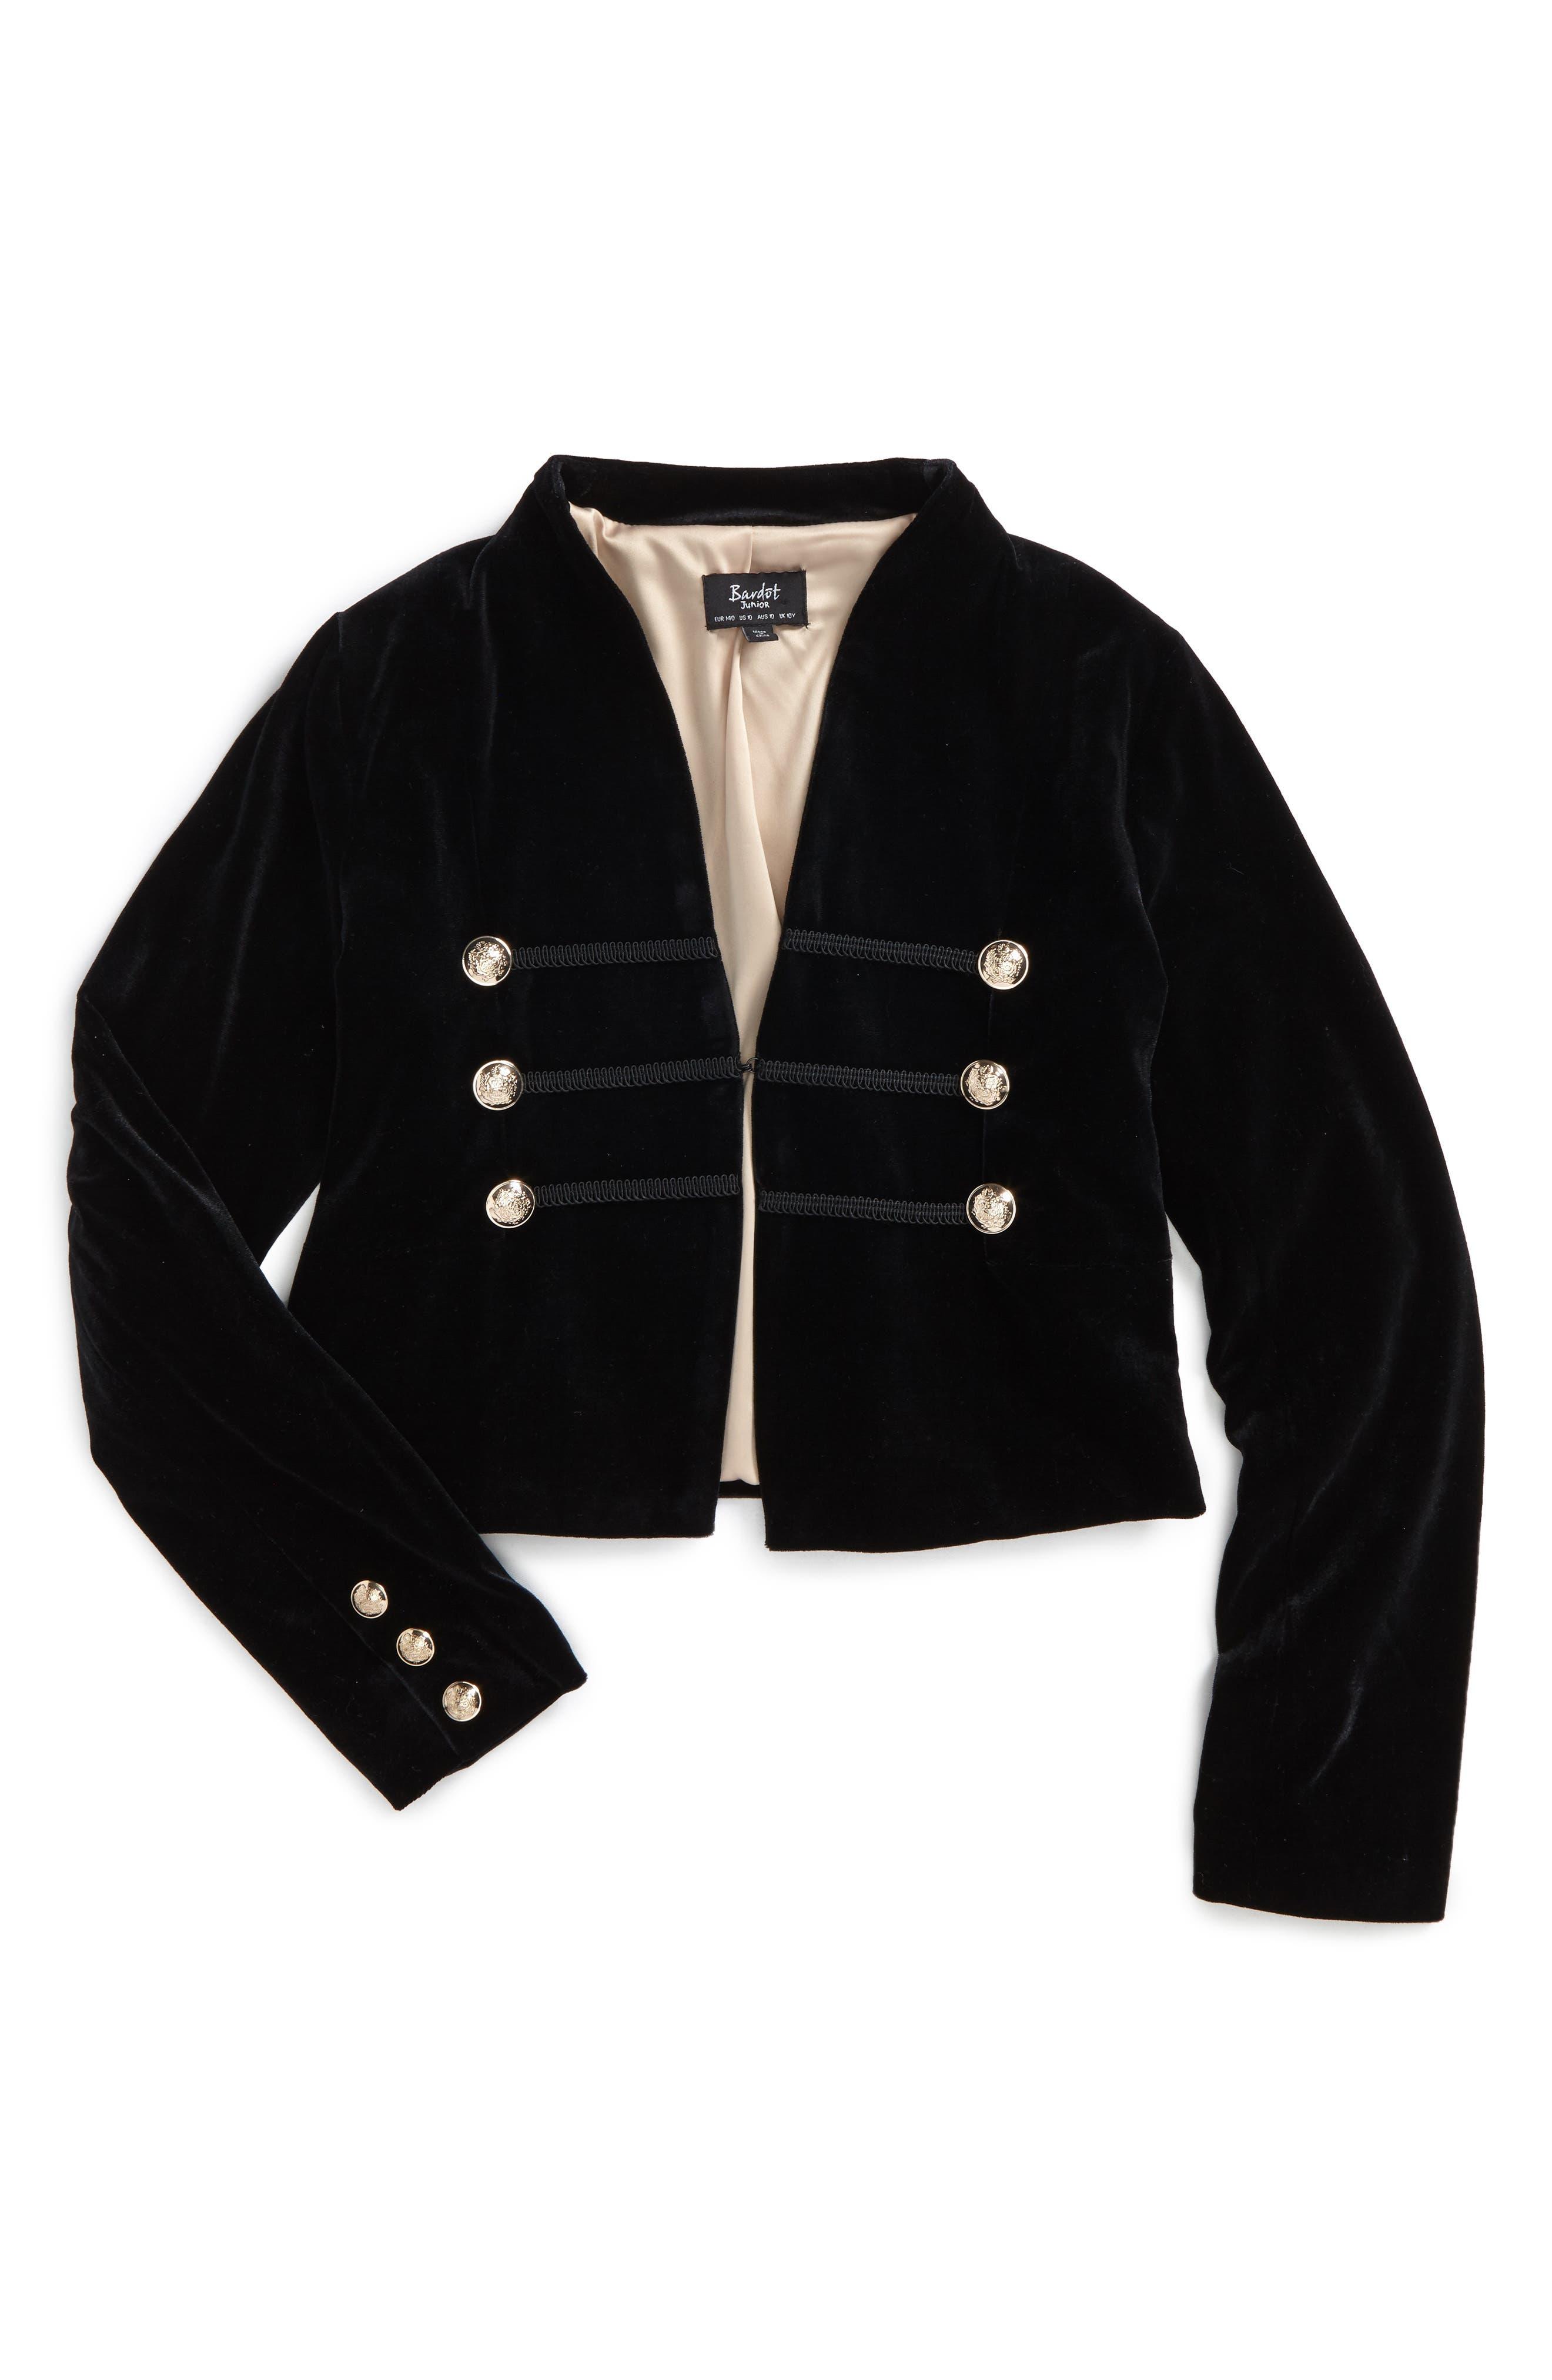 Main Image - Bardot Junior Military Jacket (Big Girls)